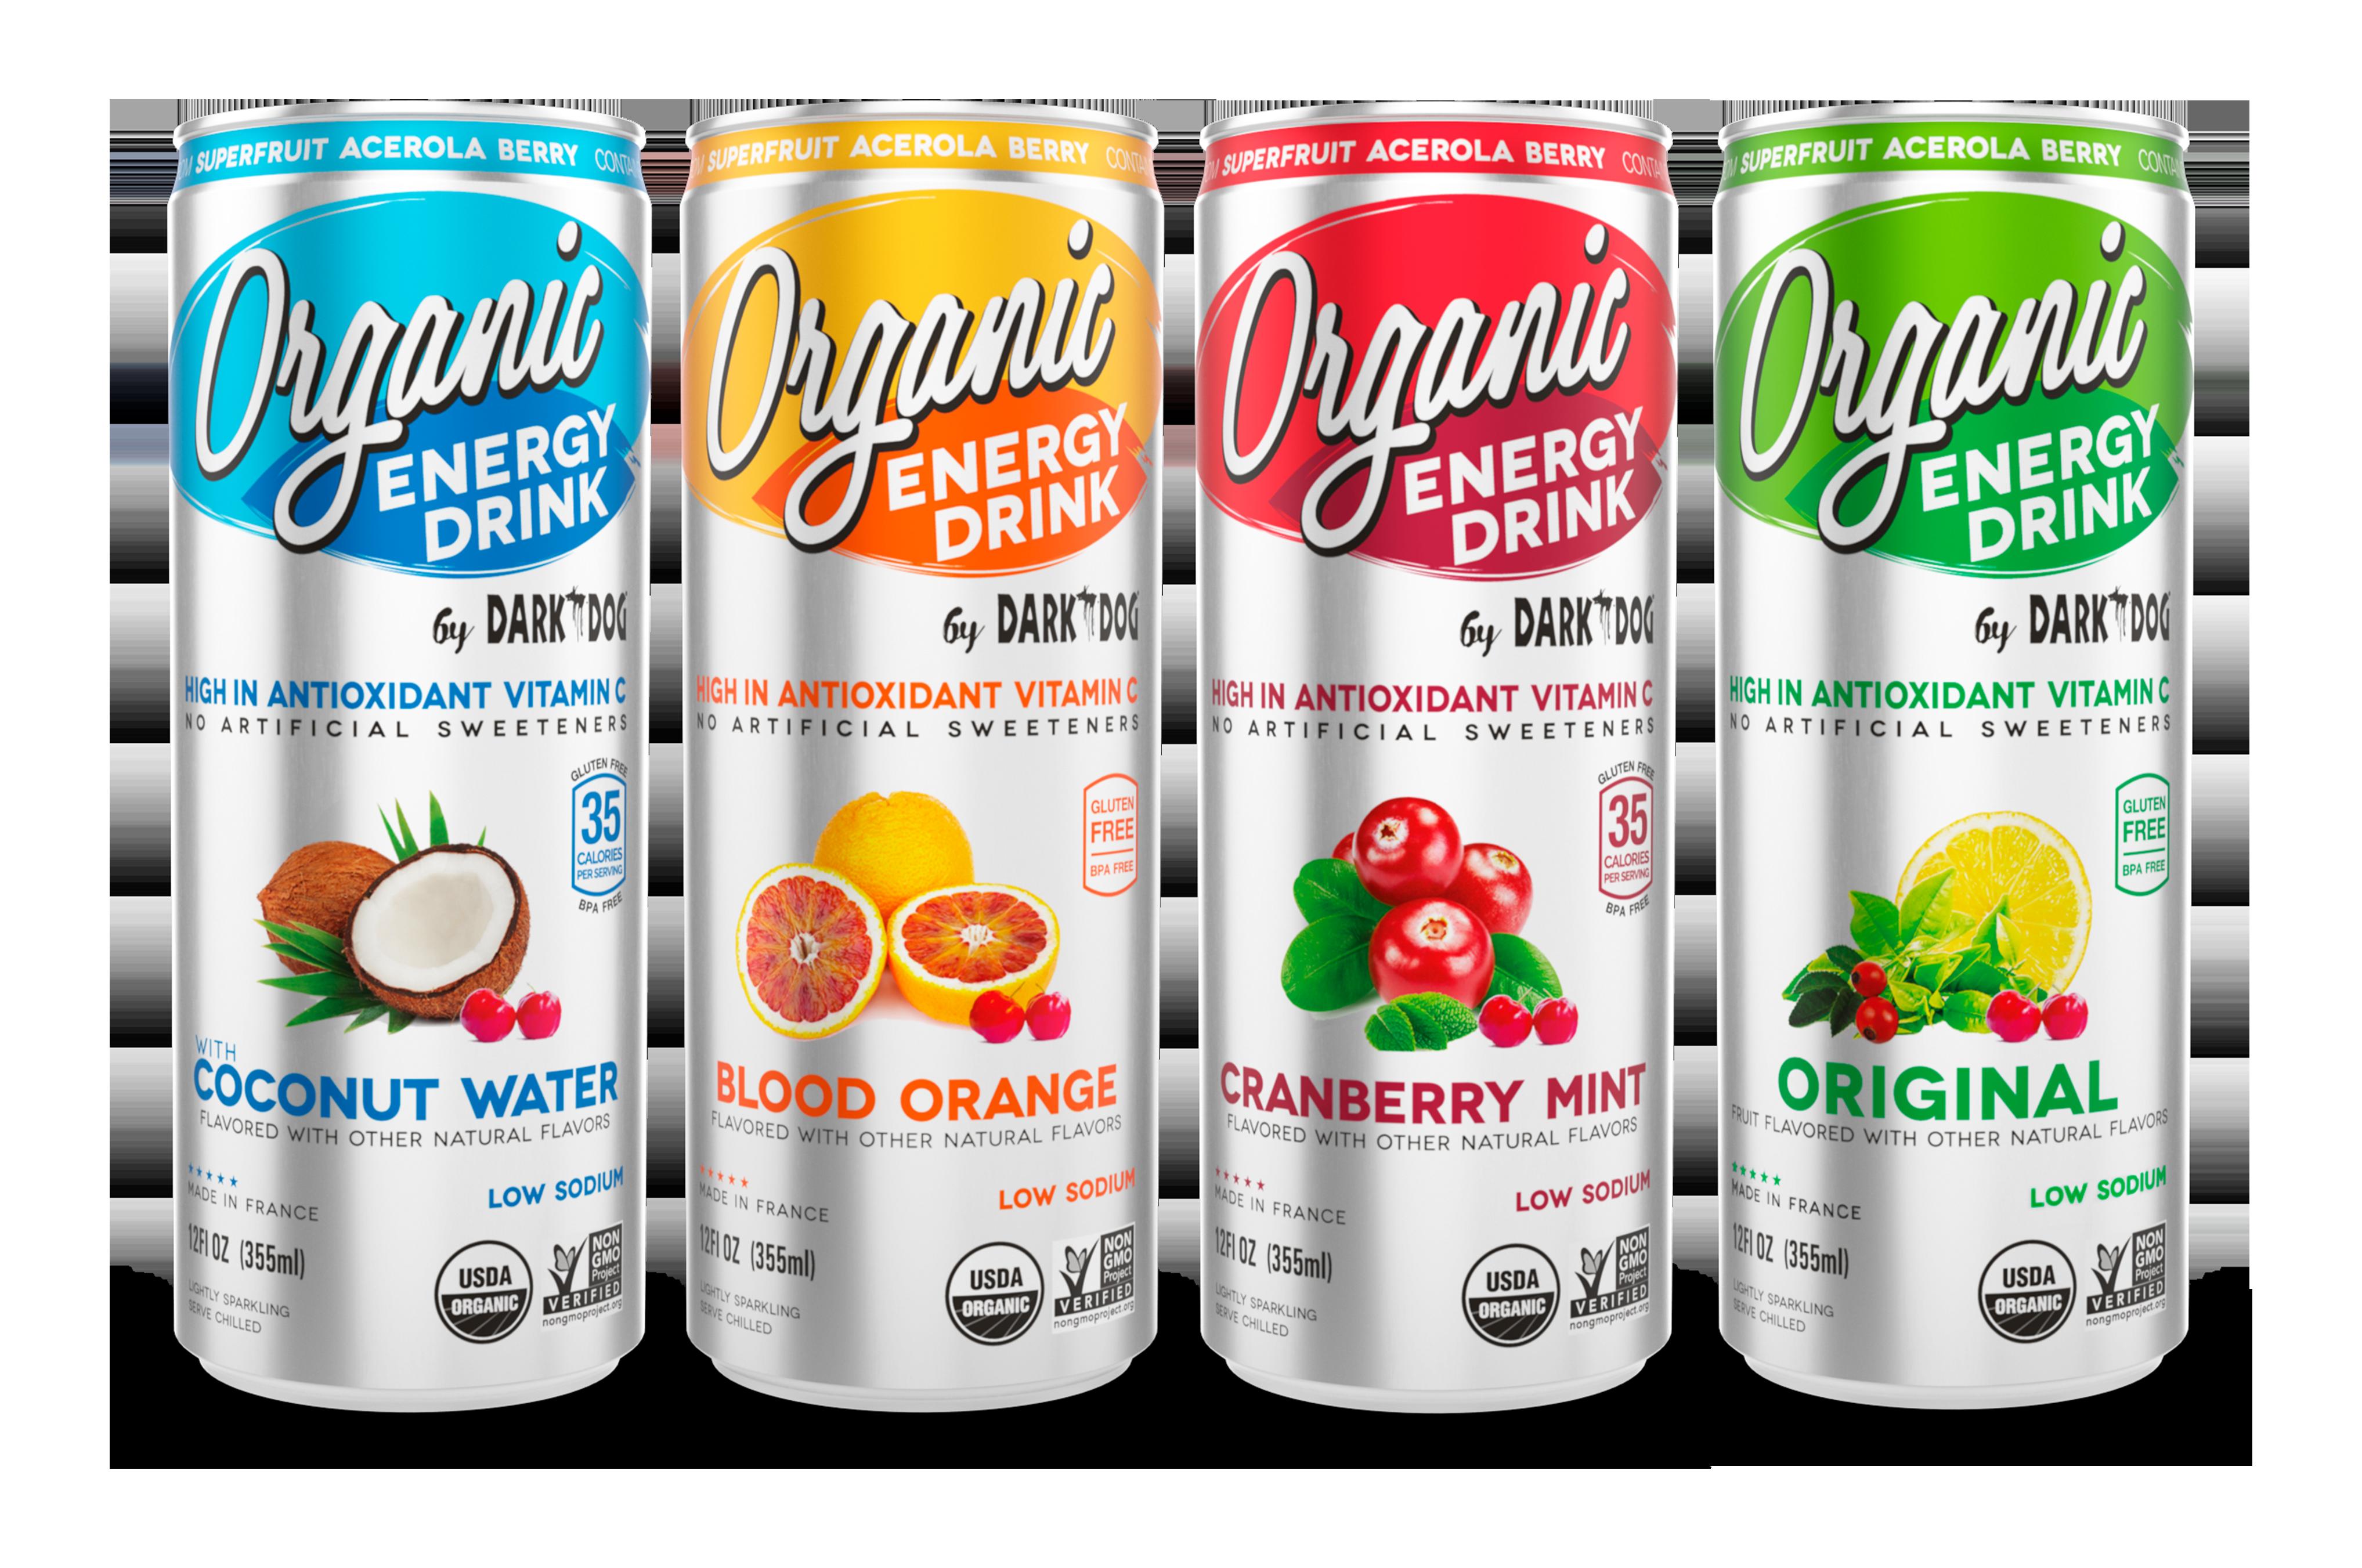 DARK DOG ORGANIC ENERGY DRINK LINE